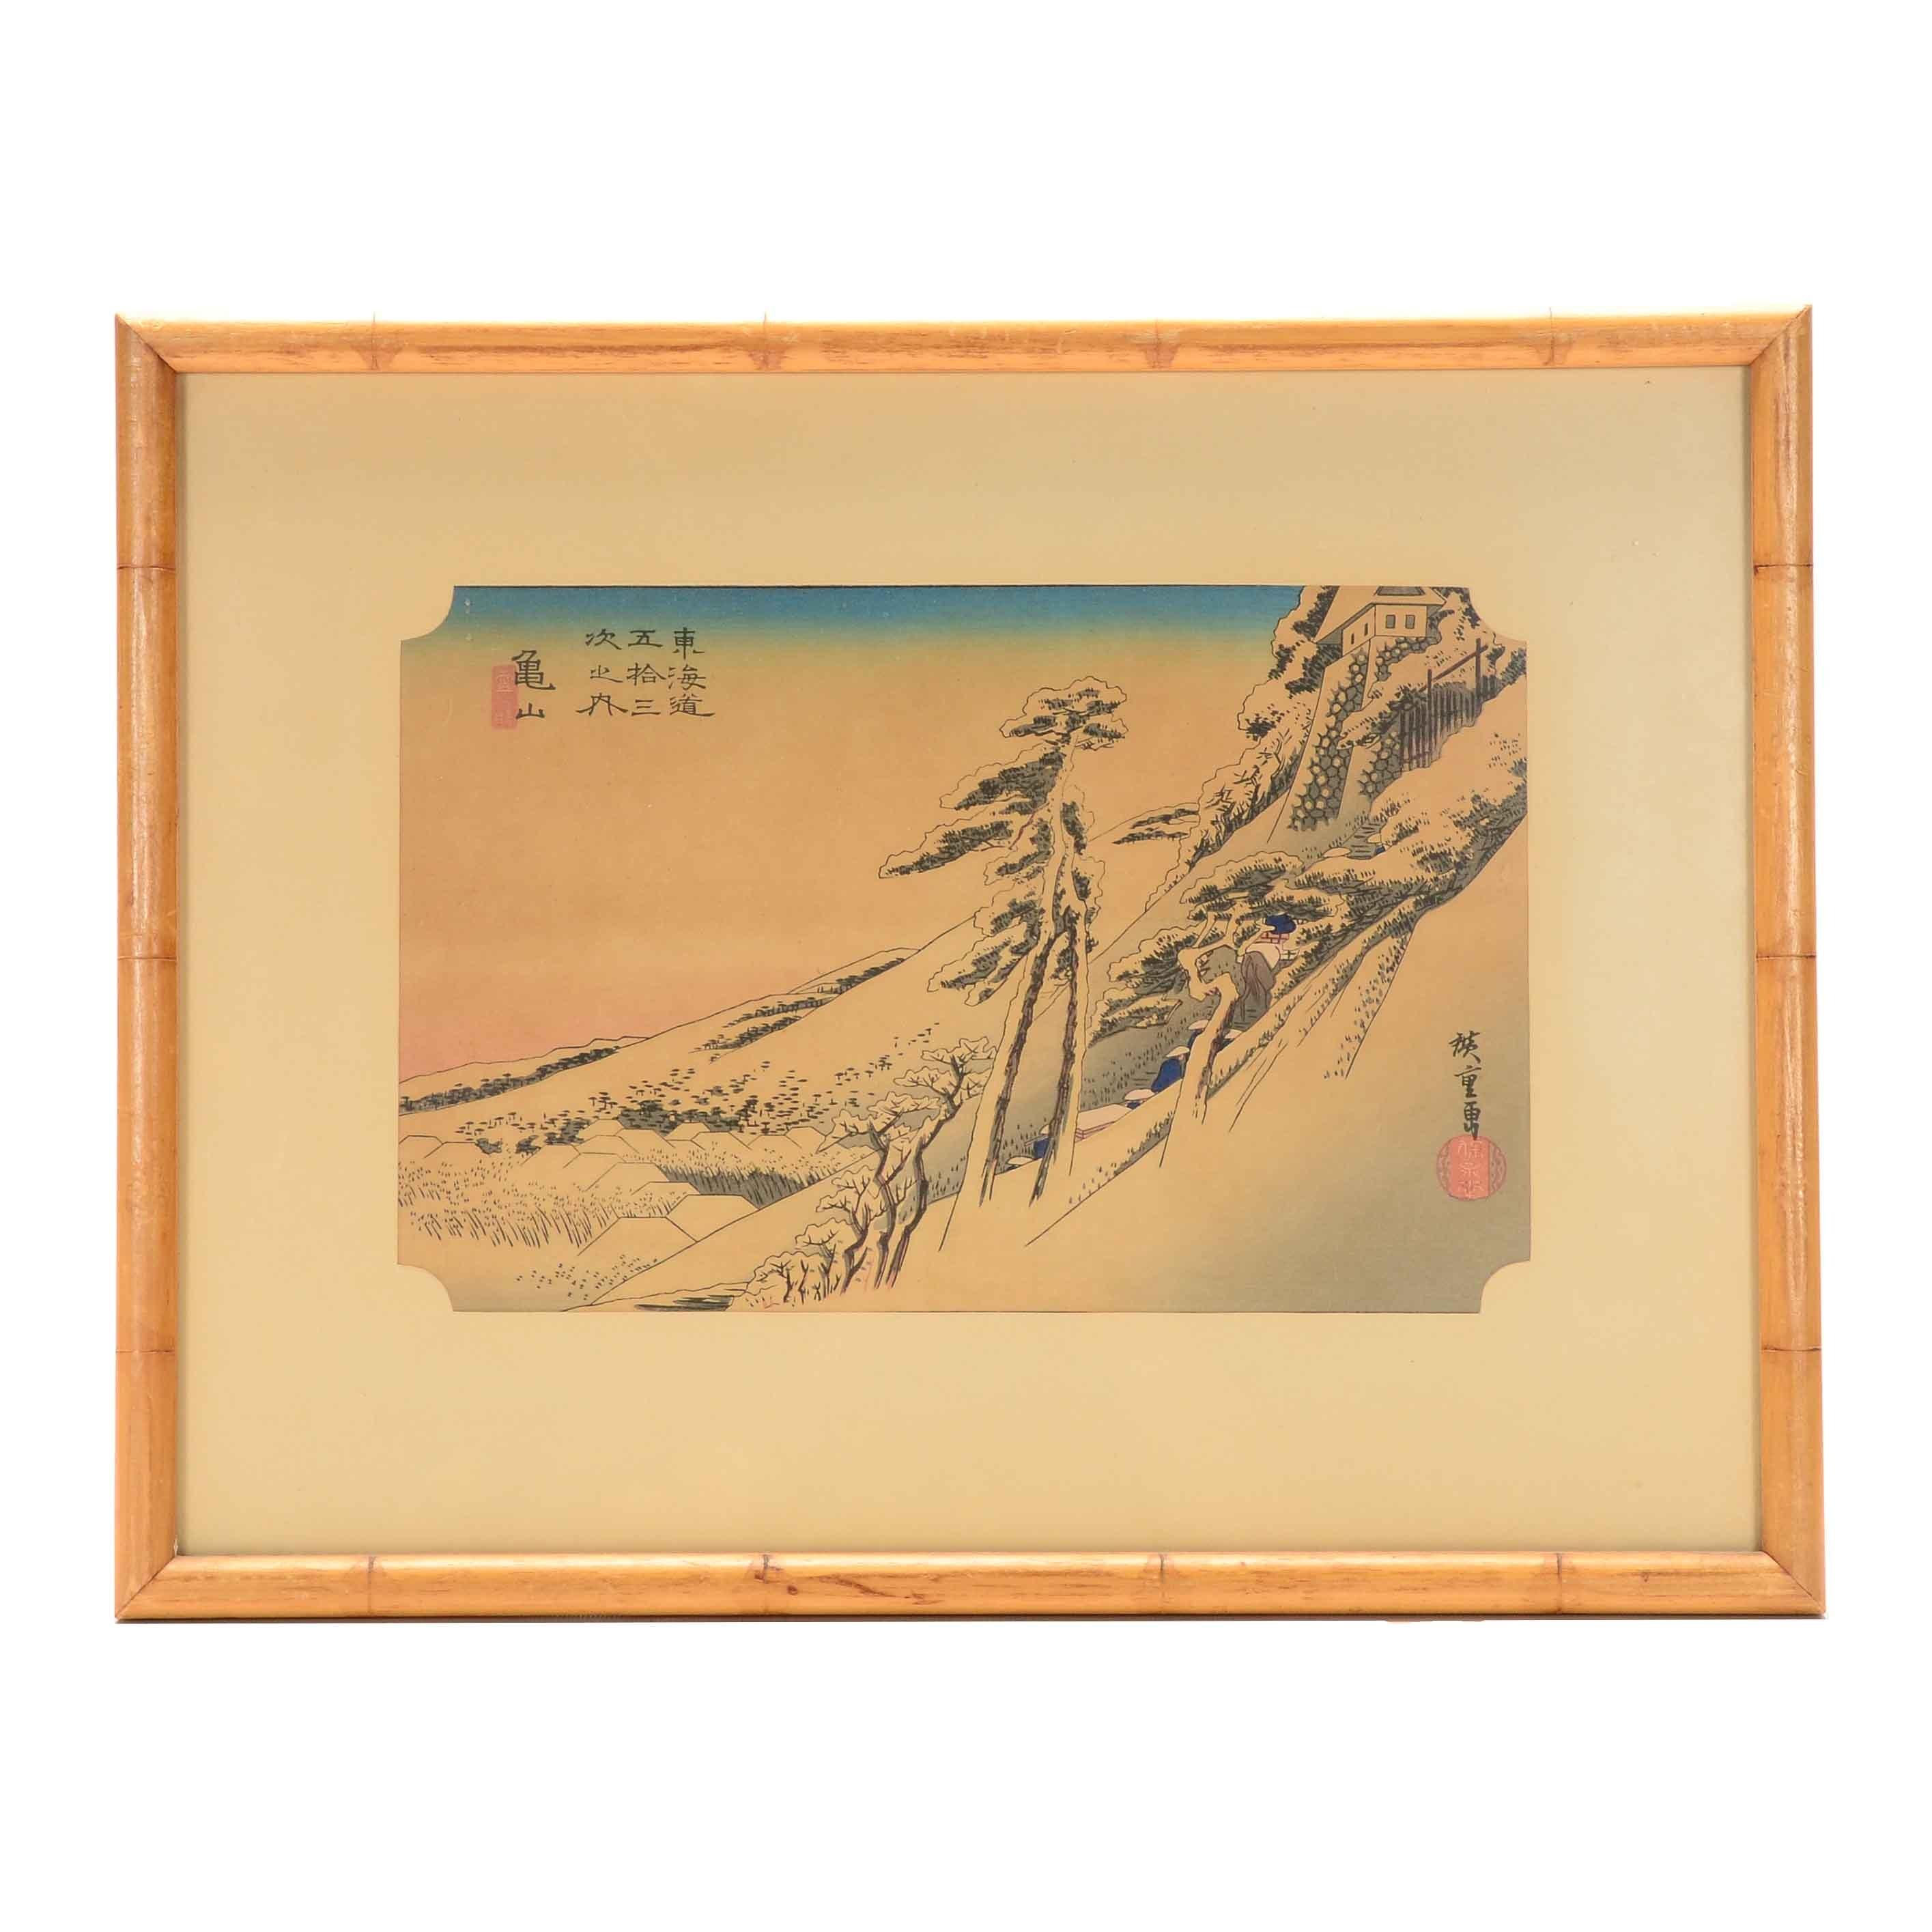 Restrike After Utagawa Hiroshige 1833 Japanese Woodblock Print